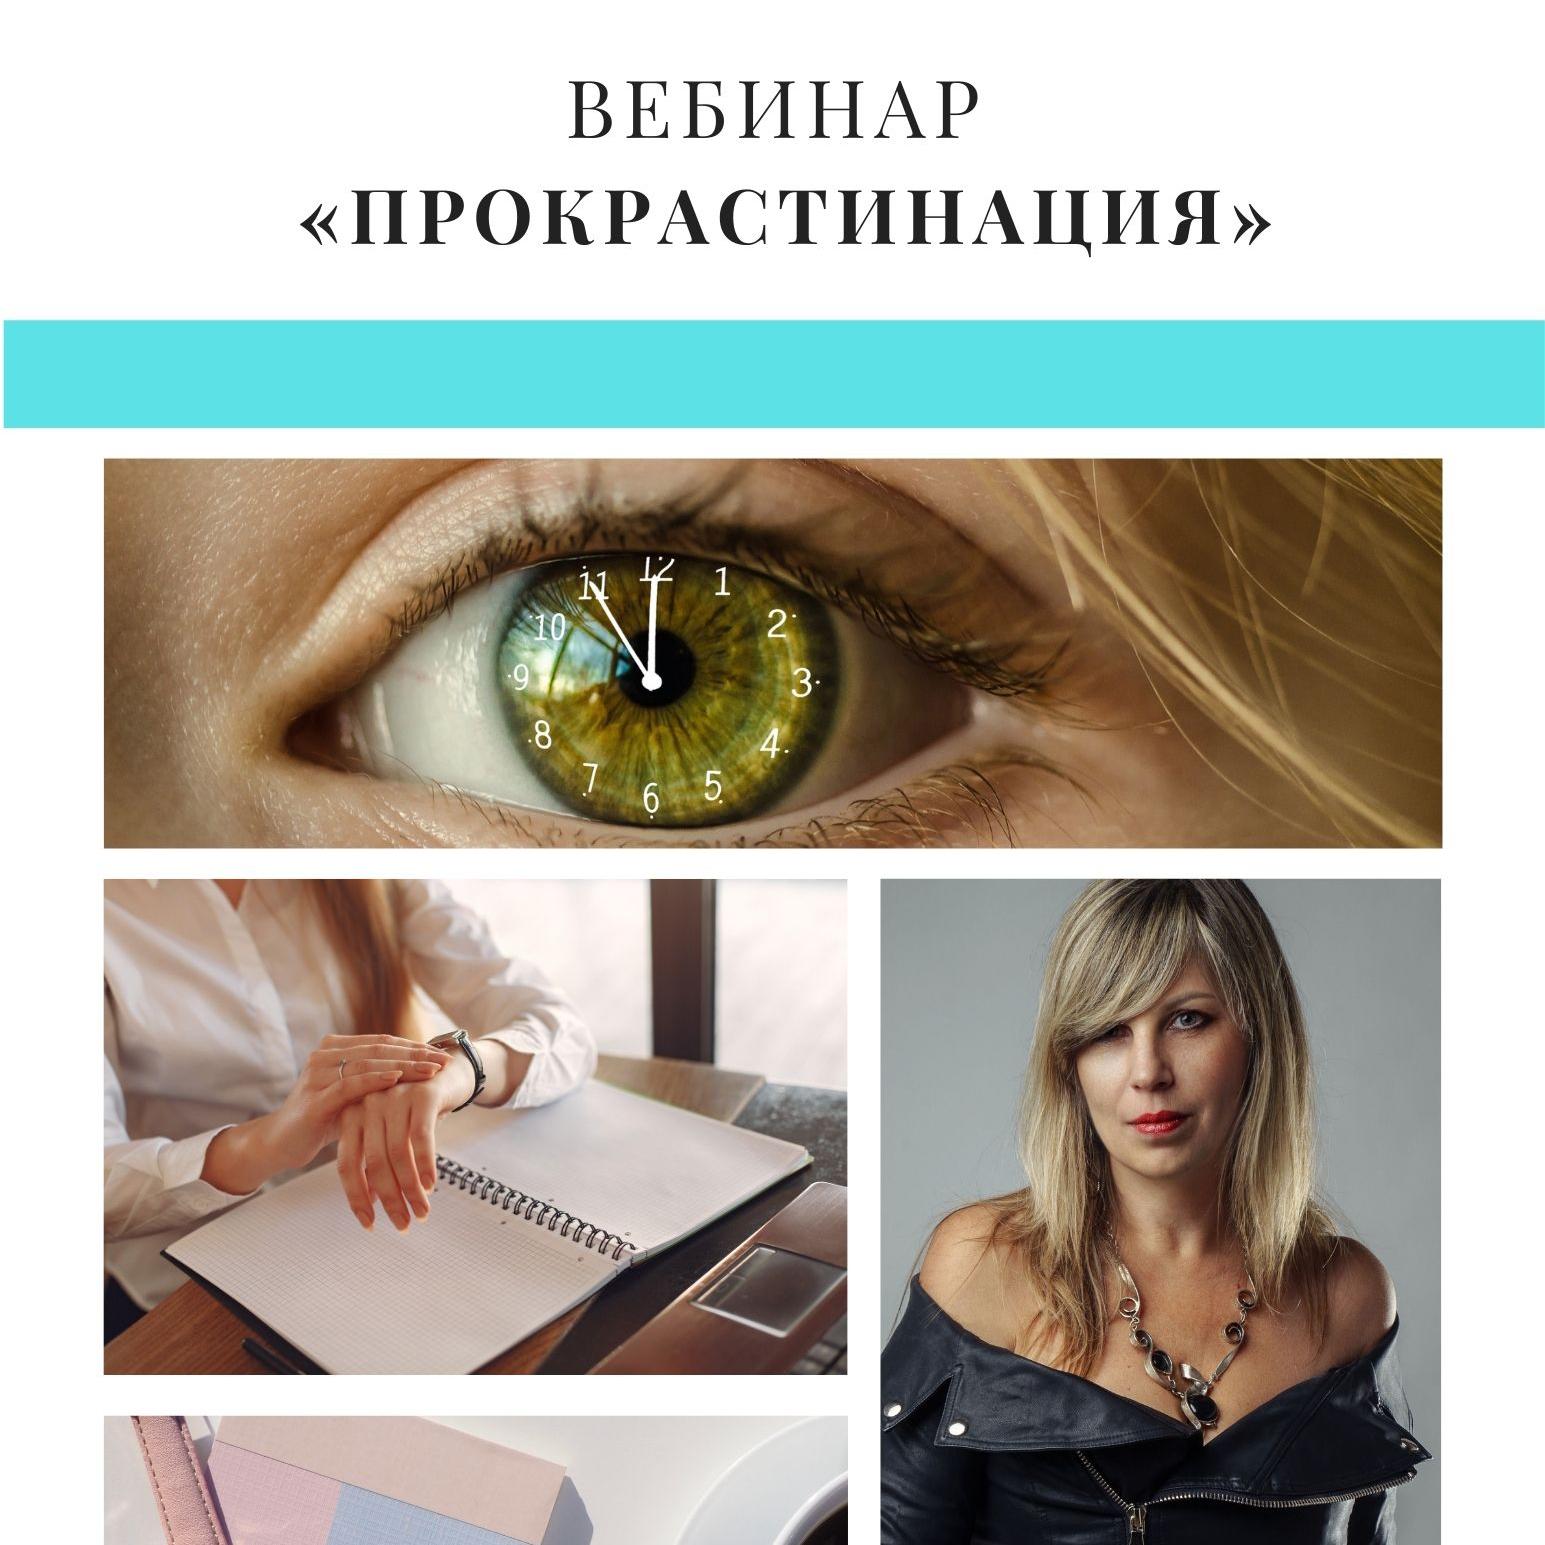 https://astrologtasha.ru/wp-content/uploads/2021/04/12.jpg